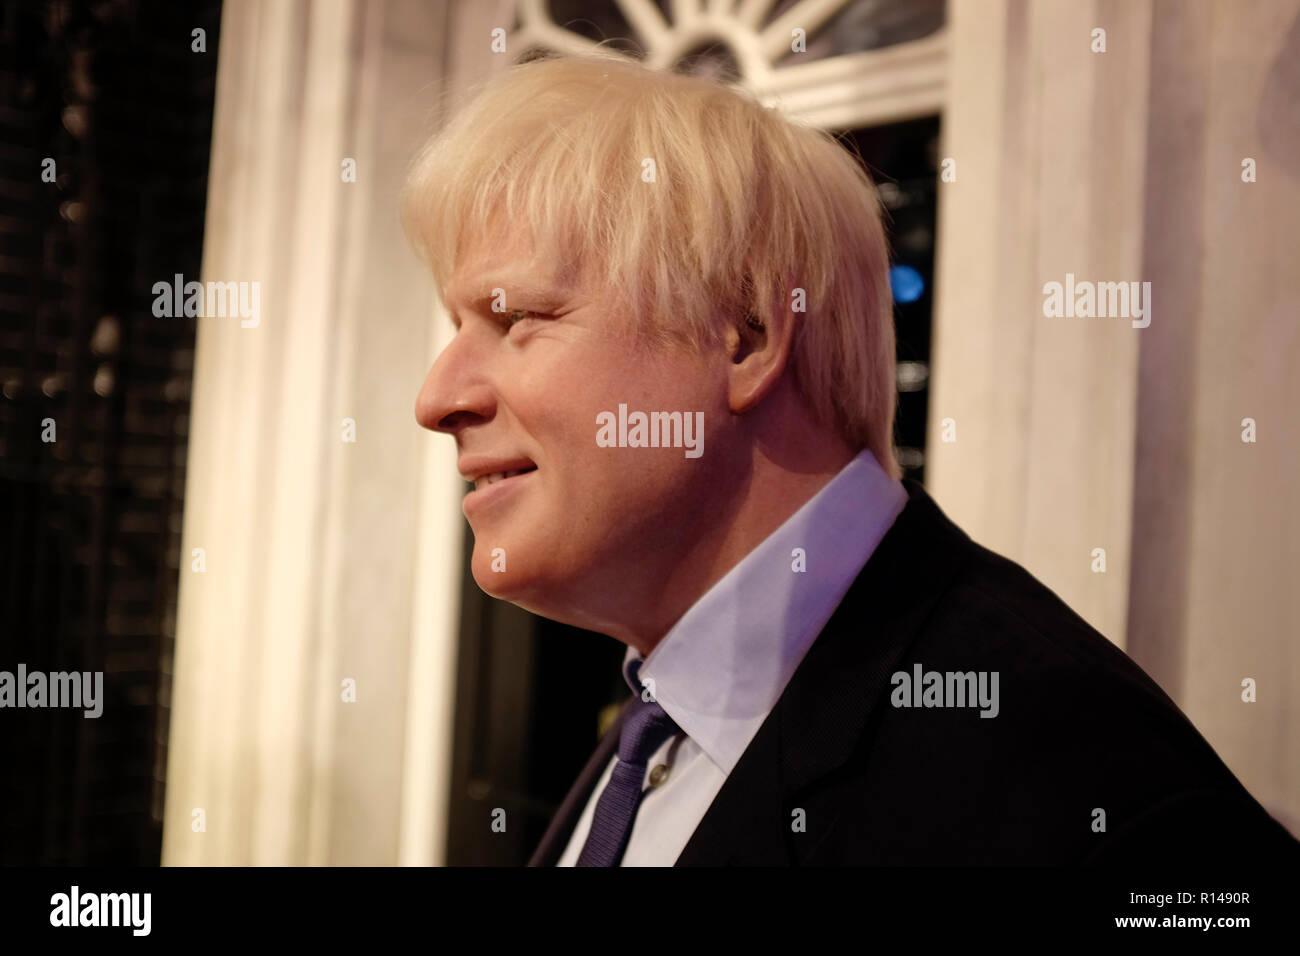 Figura de cera de Boris Johnson en atracción turística mundialmente famoso museo de cera Madame Tussauds en Londres, Reino Unido. Imagen De Stock